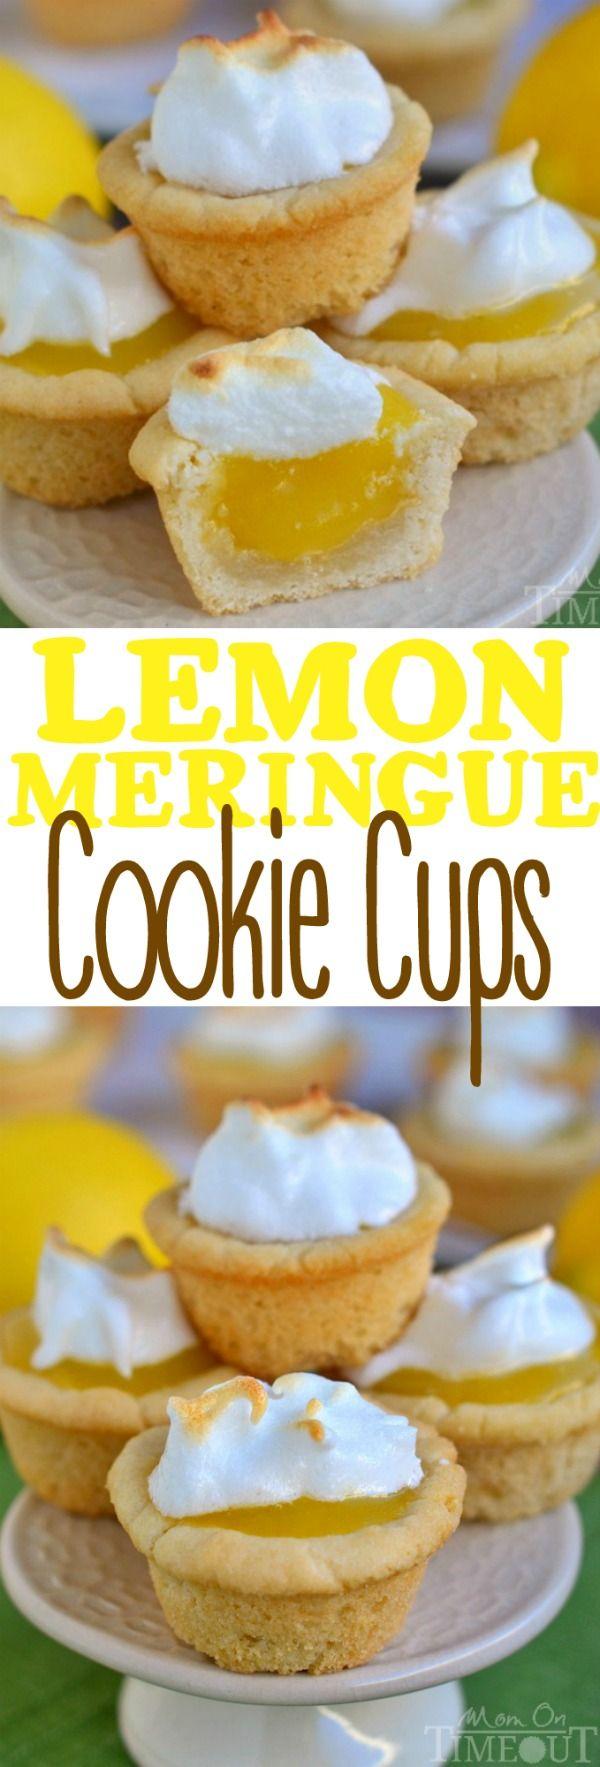 recipe: lemon curd filling for tarts [33]